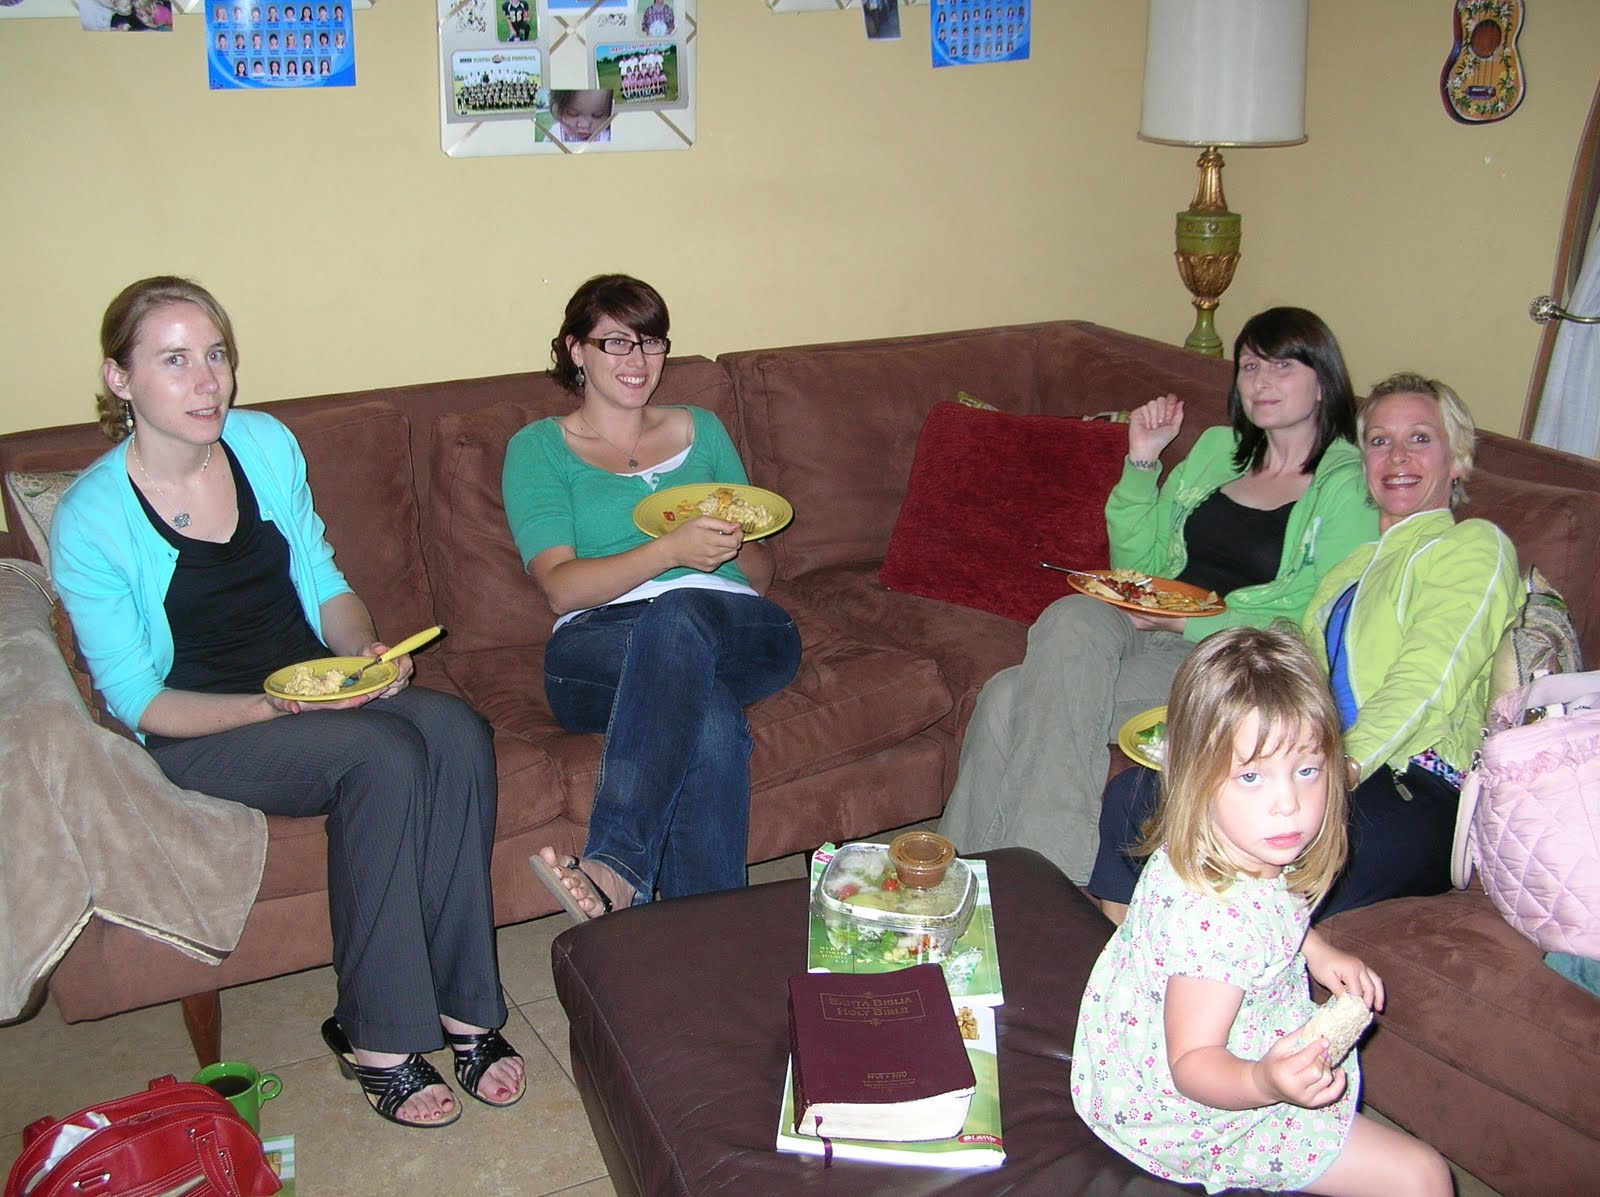 6-SESSION BIBLE STUDY ESTHER - s7d9.scene7.com